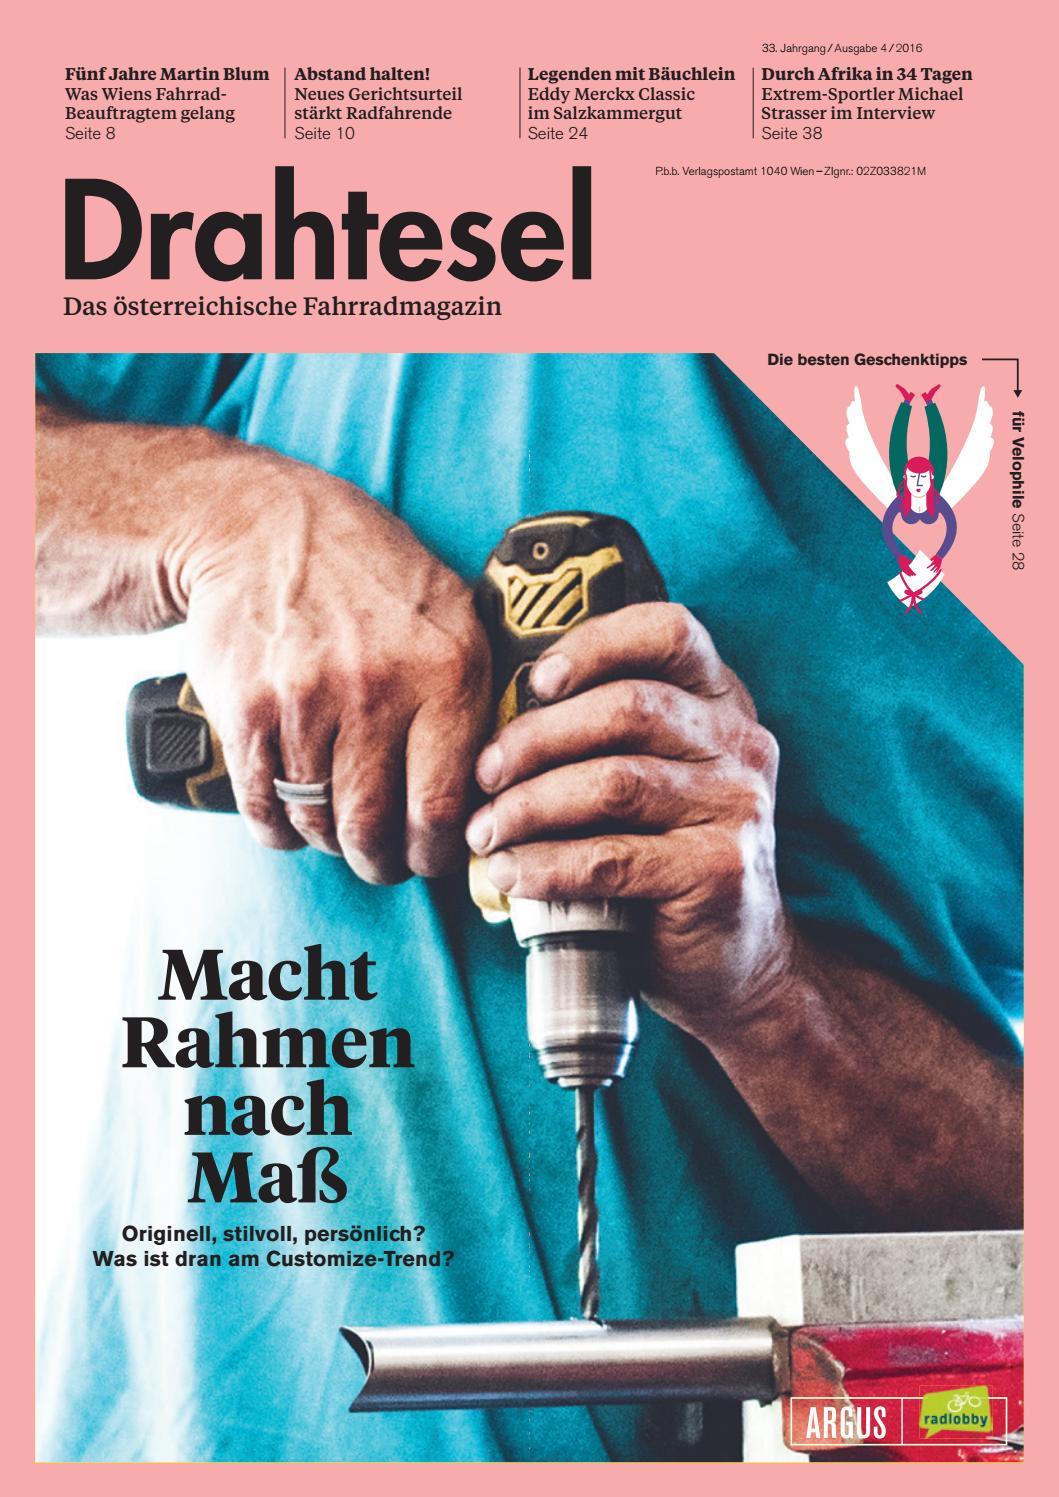 DRAHTESEL 2016-4 by Radlobby ARGUS - issuu